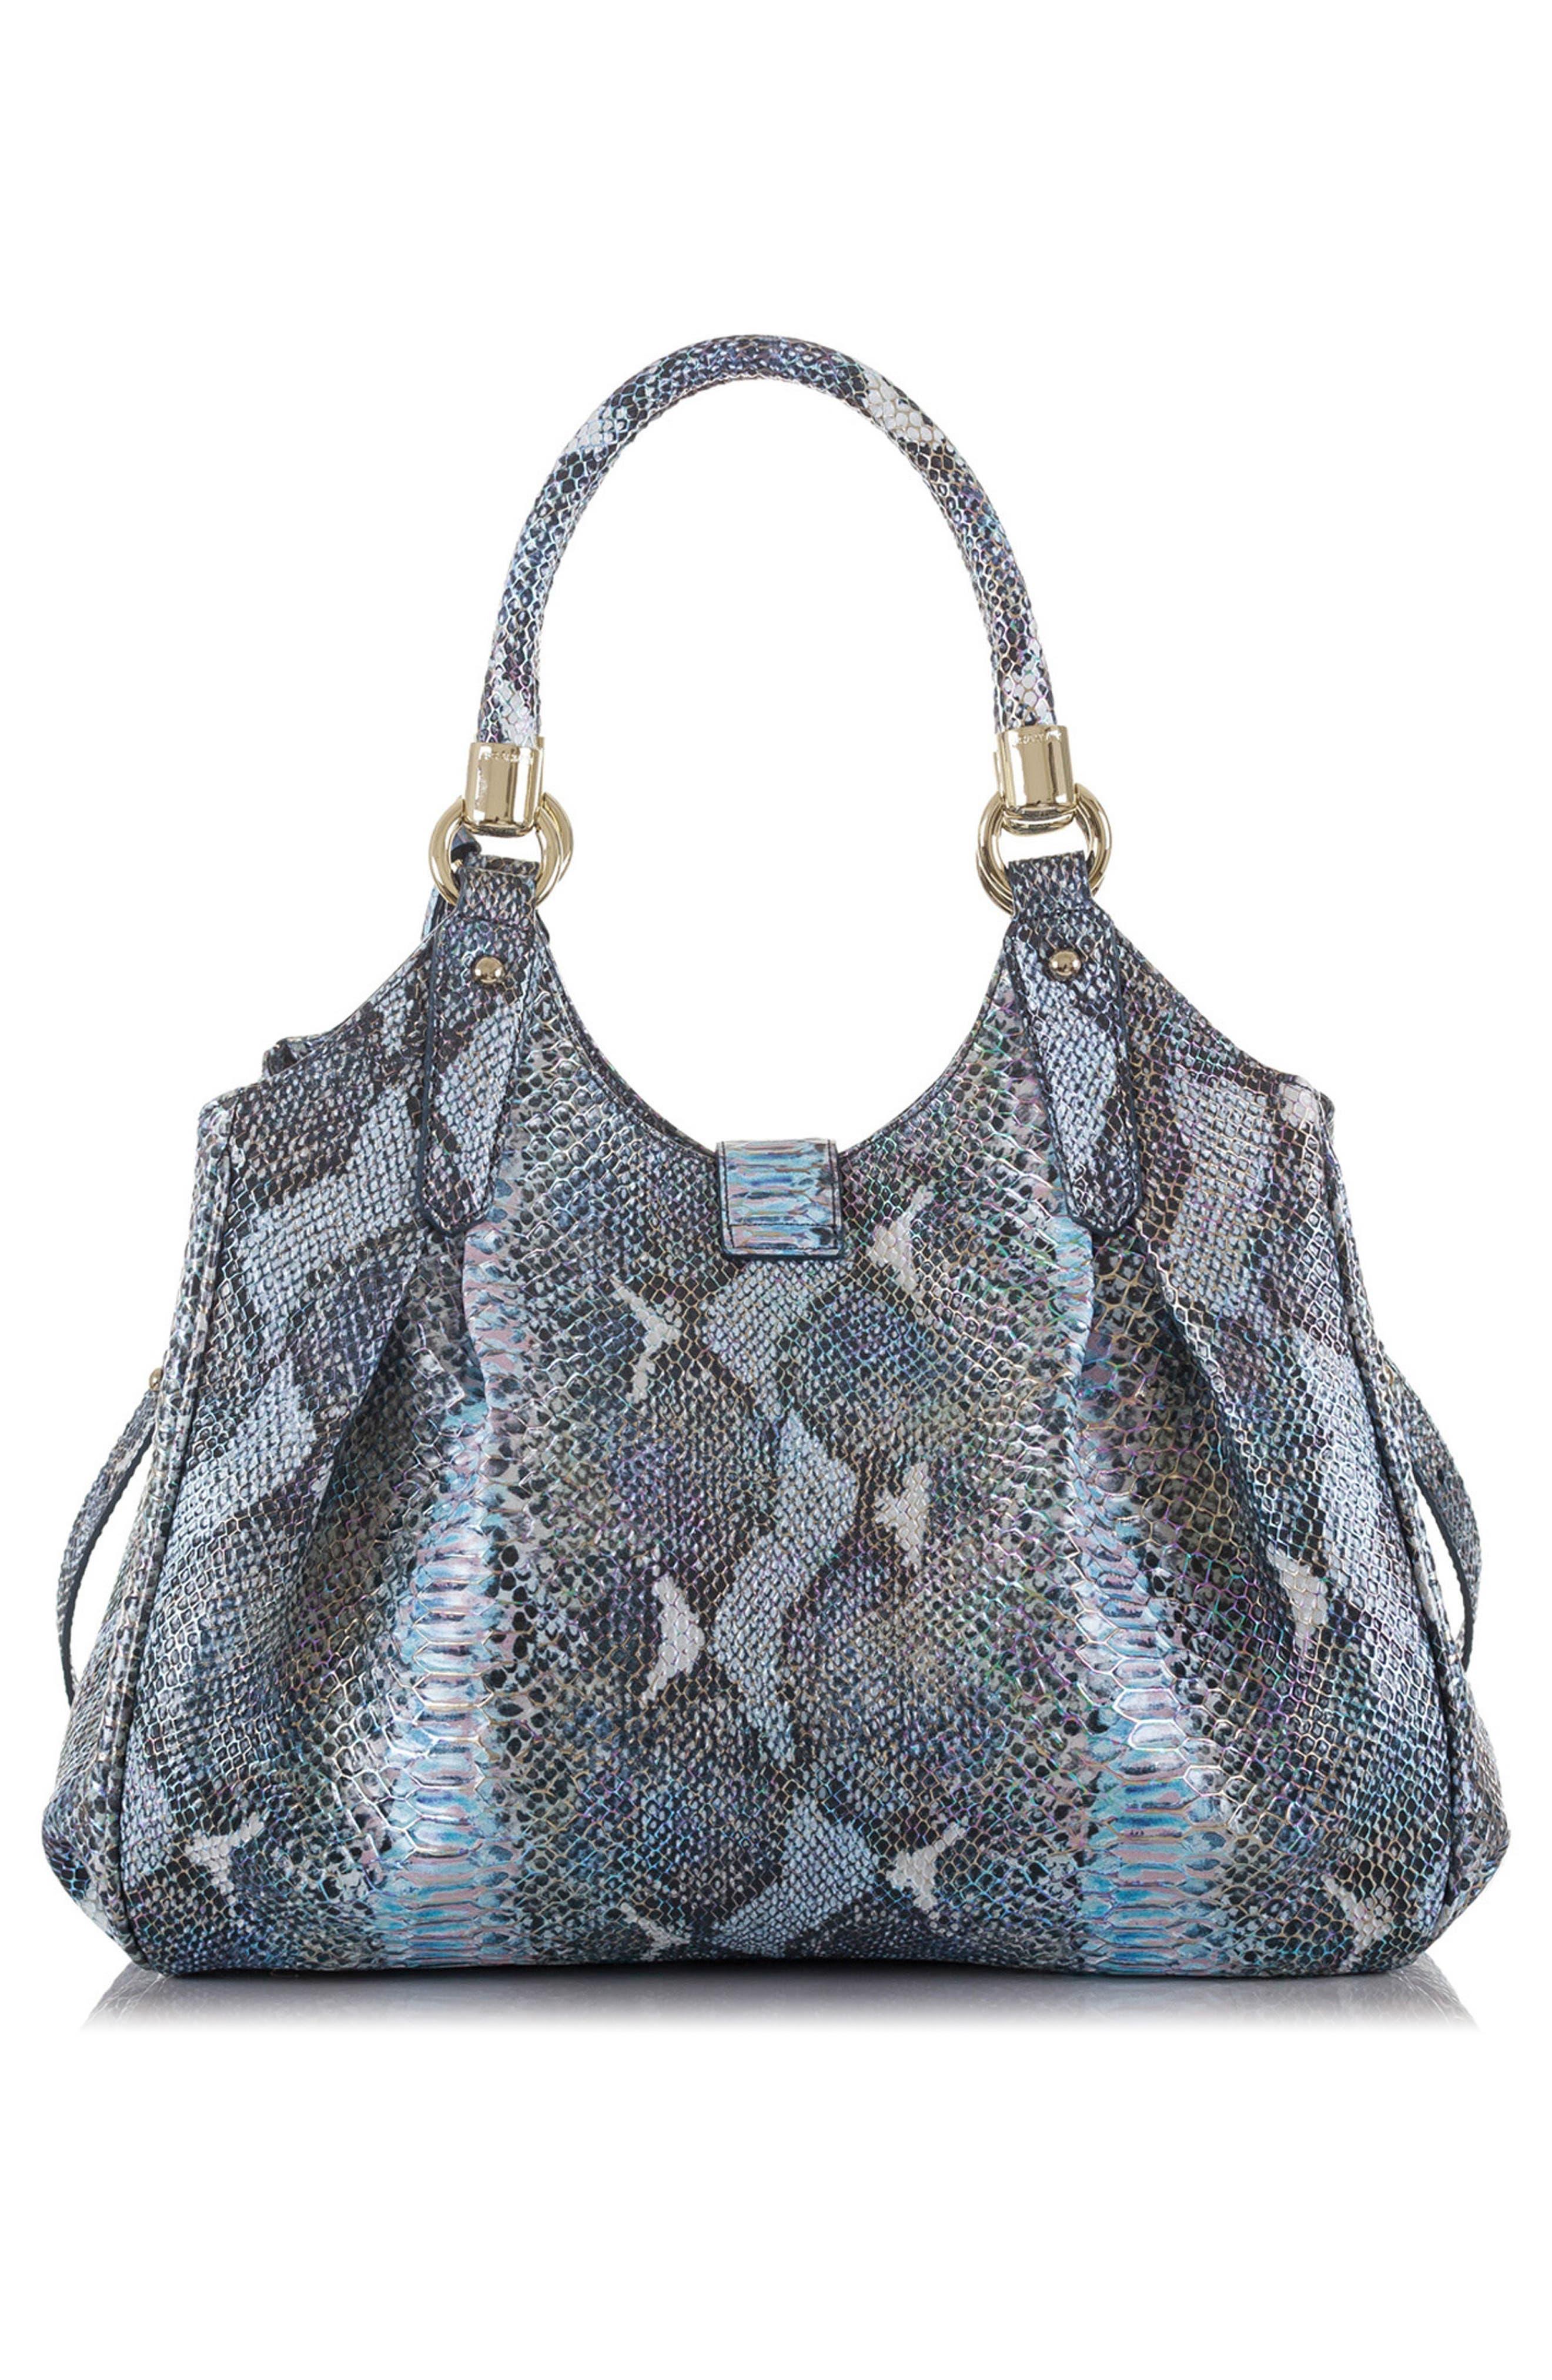 'Elisa' Leather Shopper,                             Alternate thumbnail 2, color,                             400